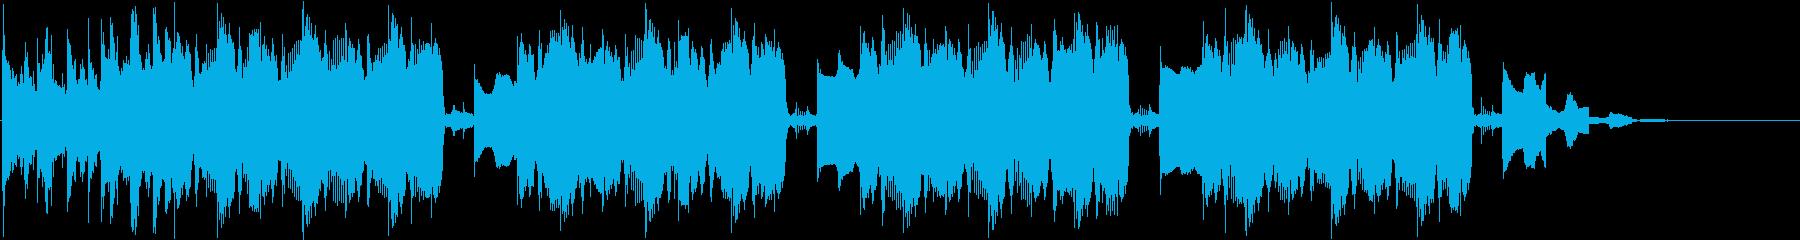 tiktokで使えるEDM曲の再生済みの波形